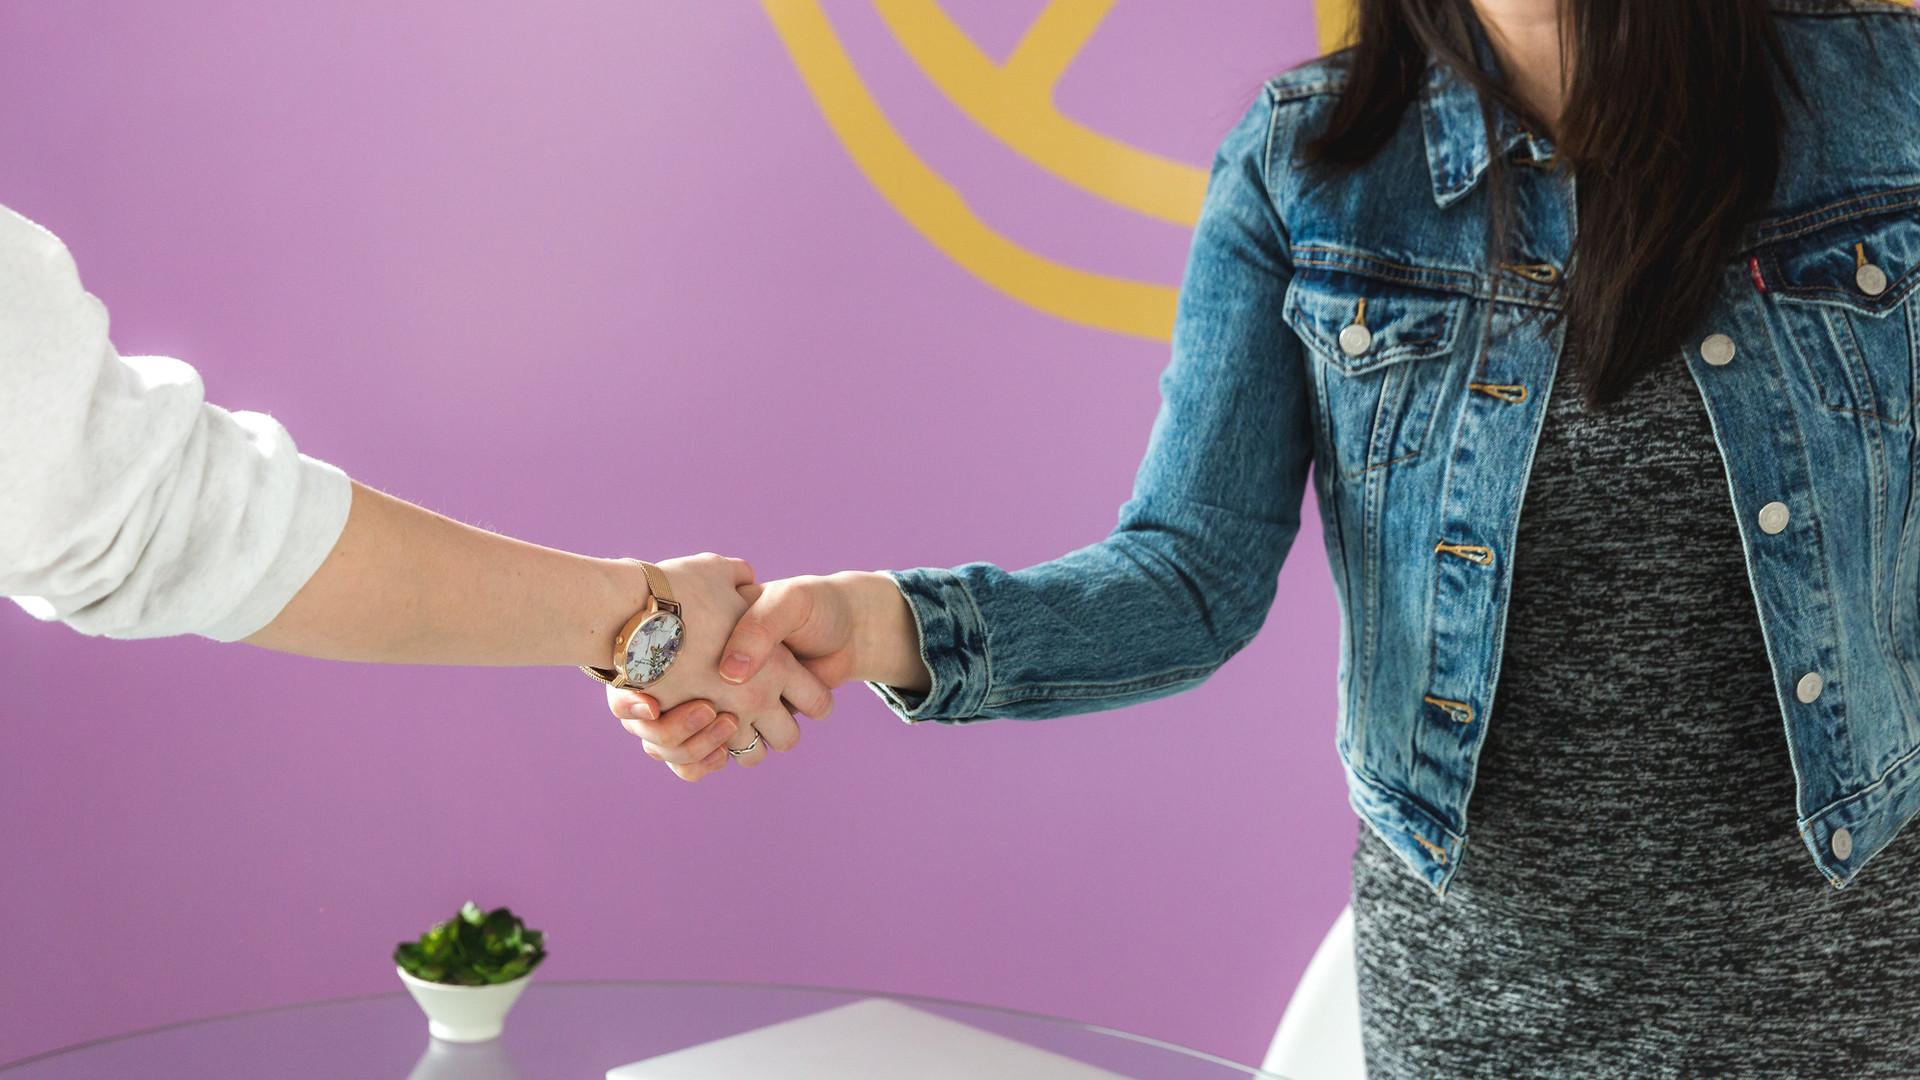 business-woman-shakes-hand - Copy.jpg